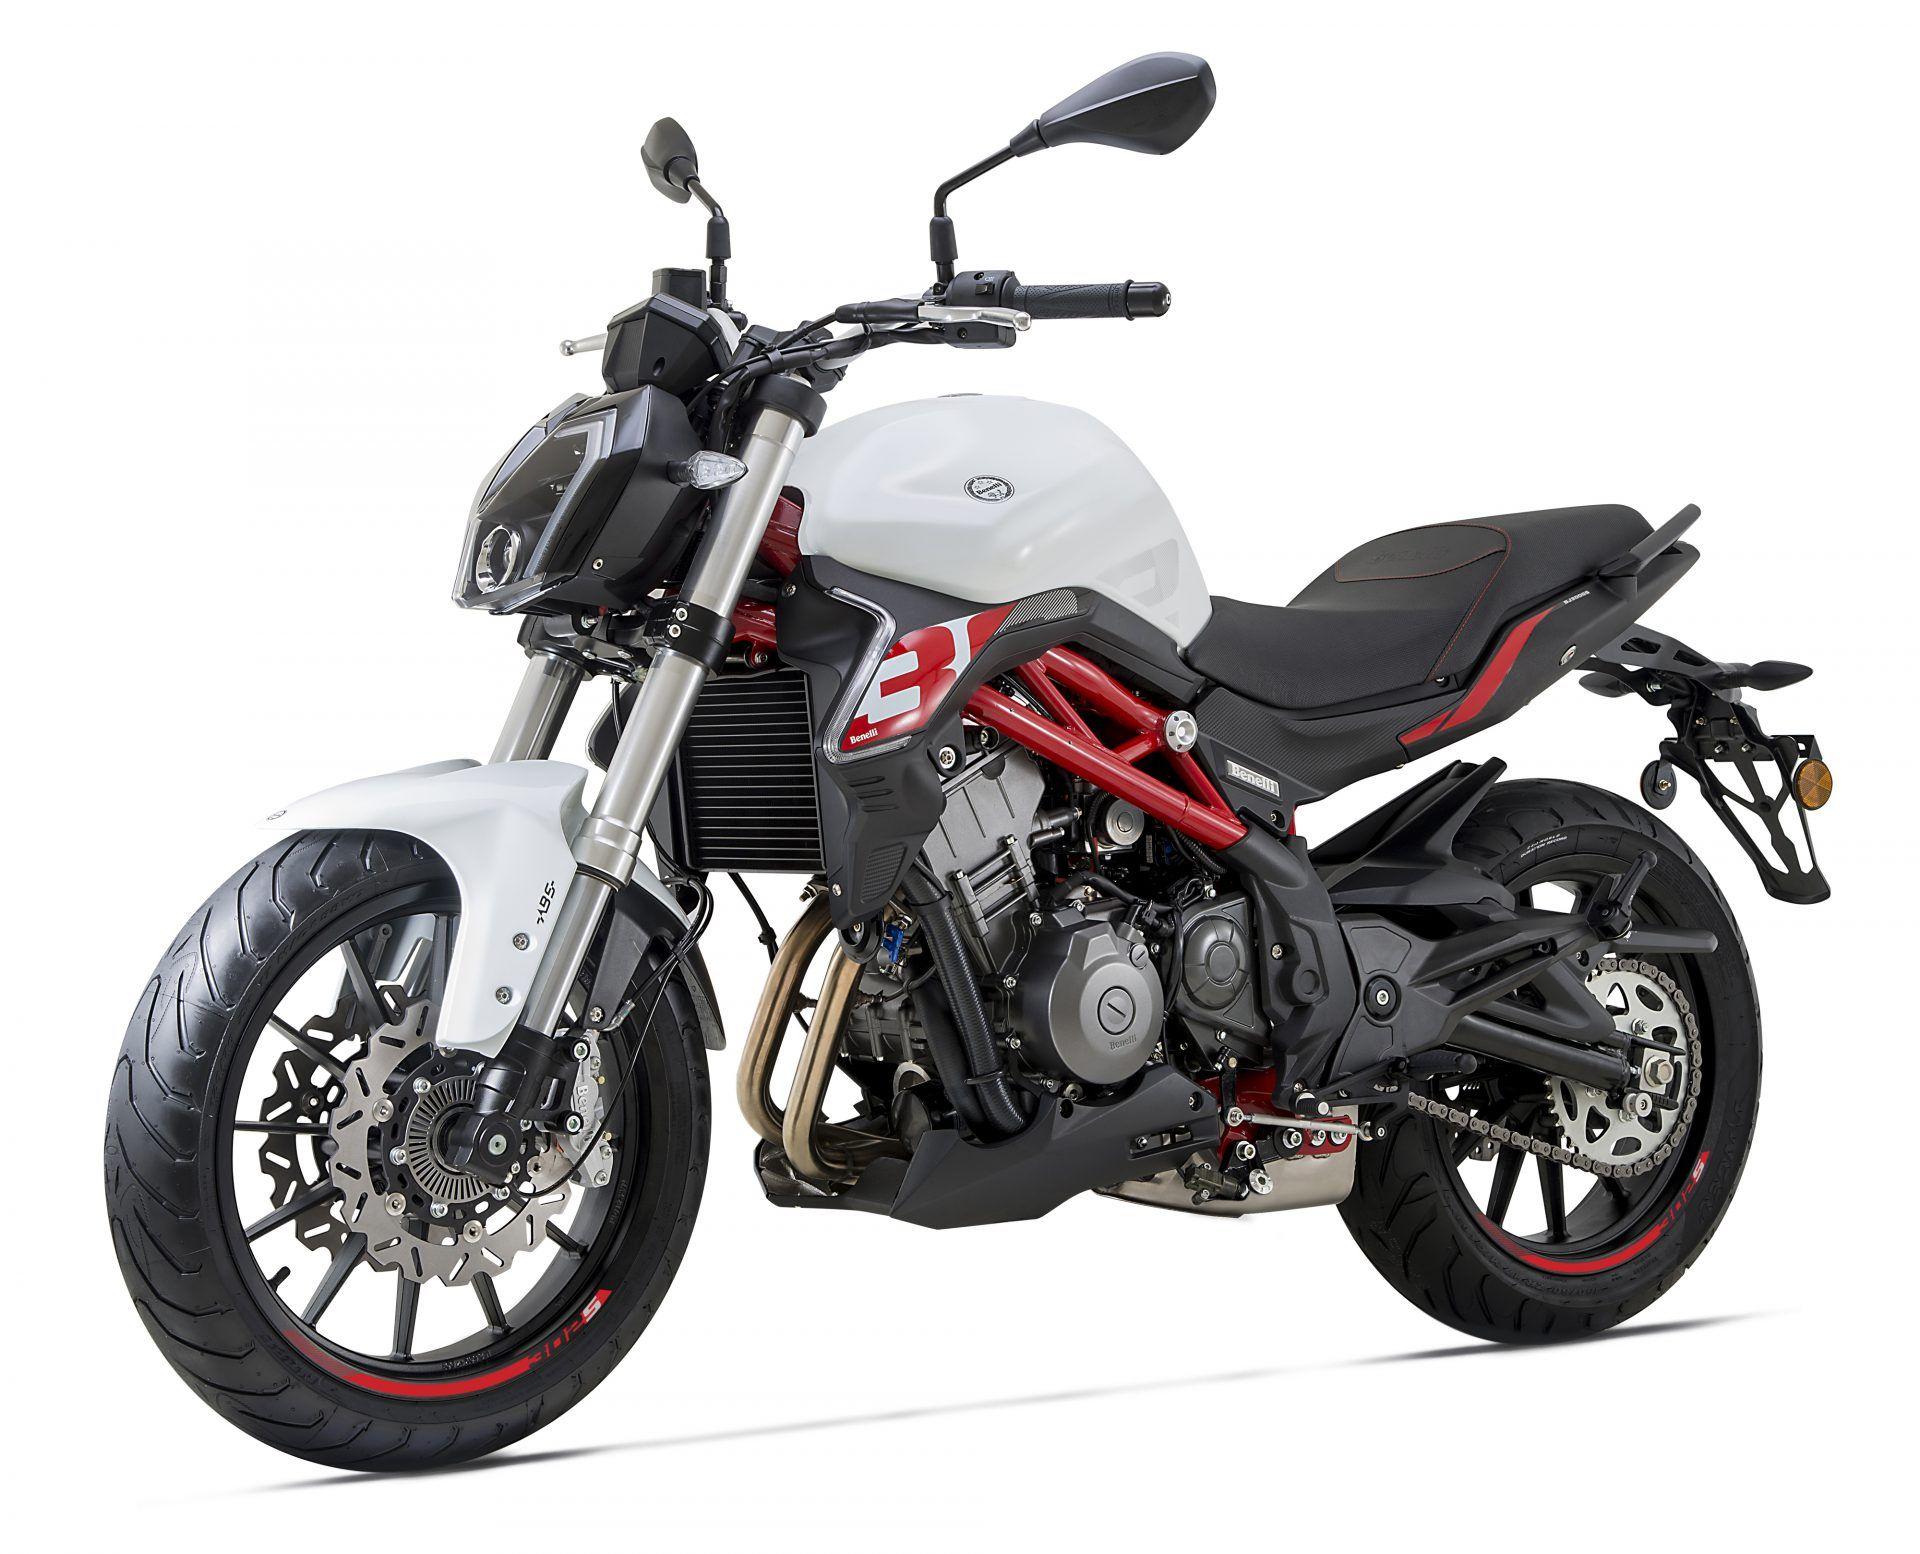 BENELLI BN 302 2020 300cc STREET price, specifications, videos